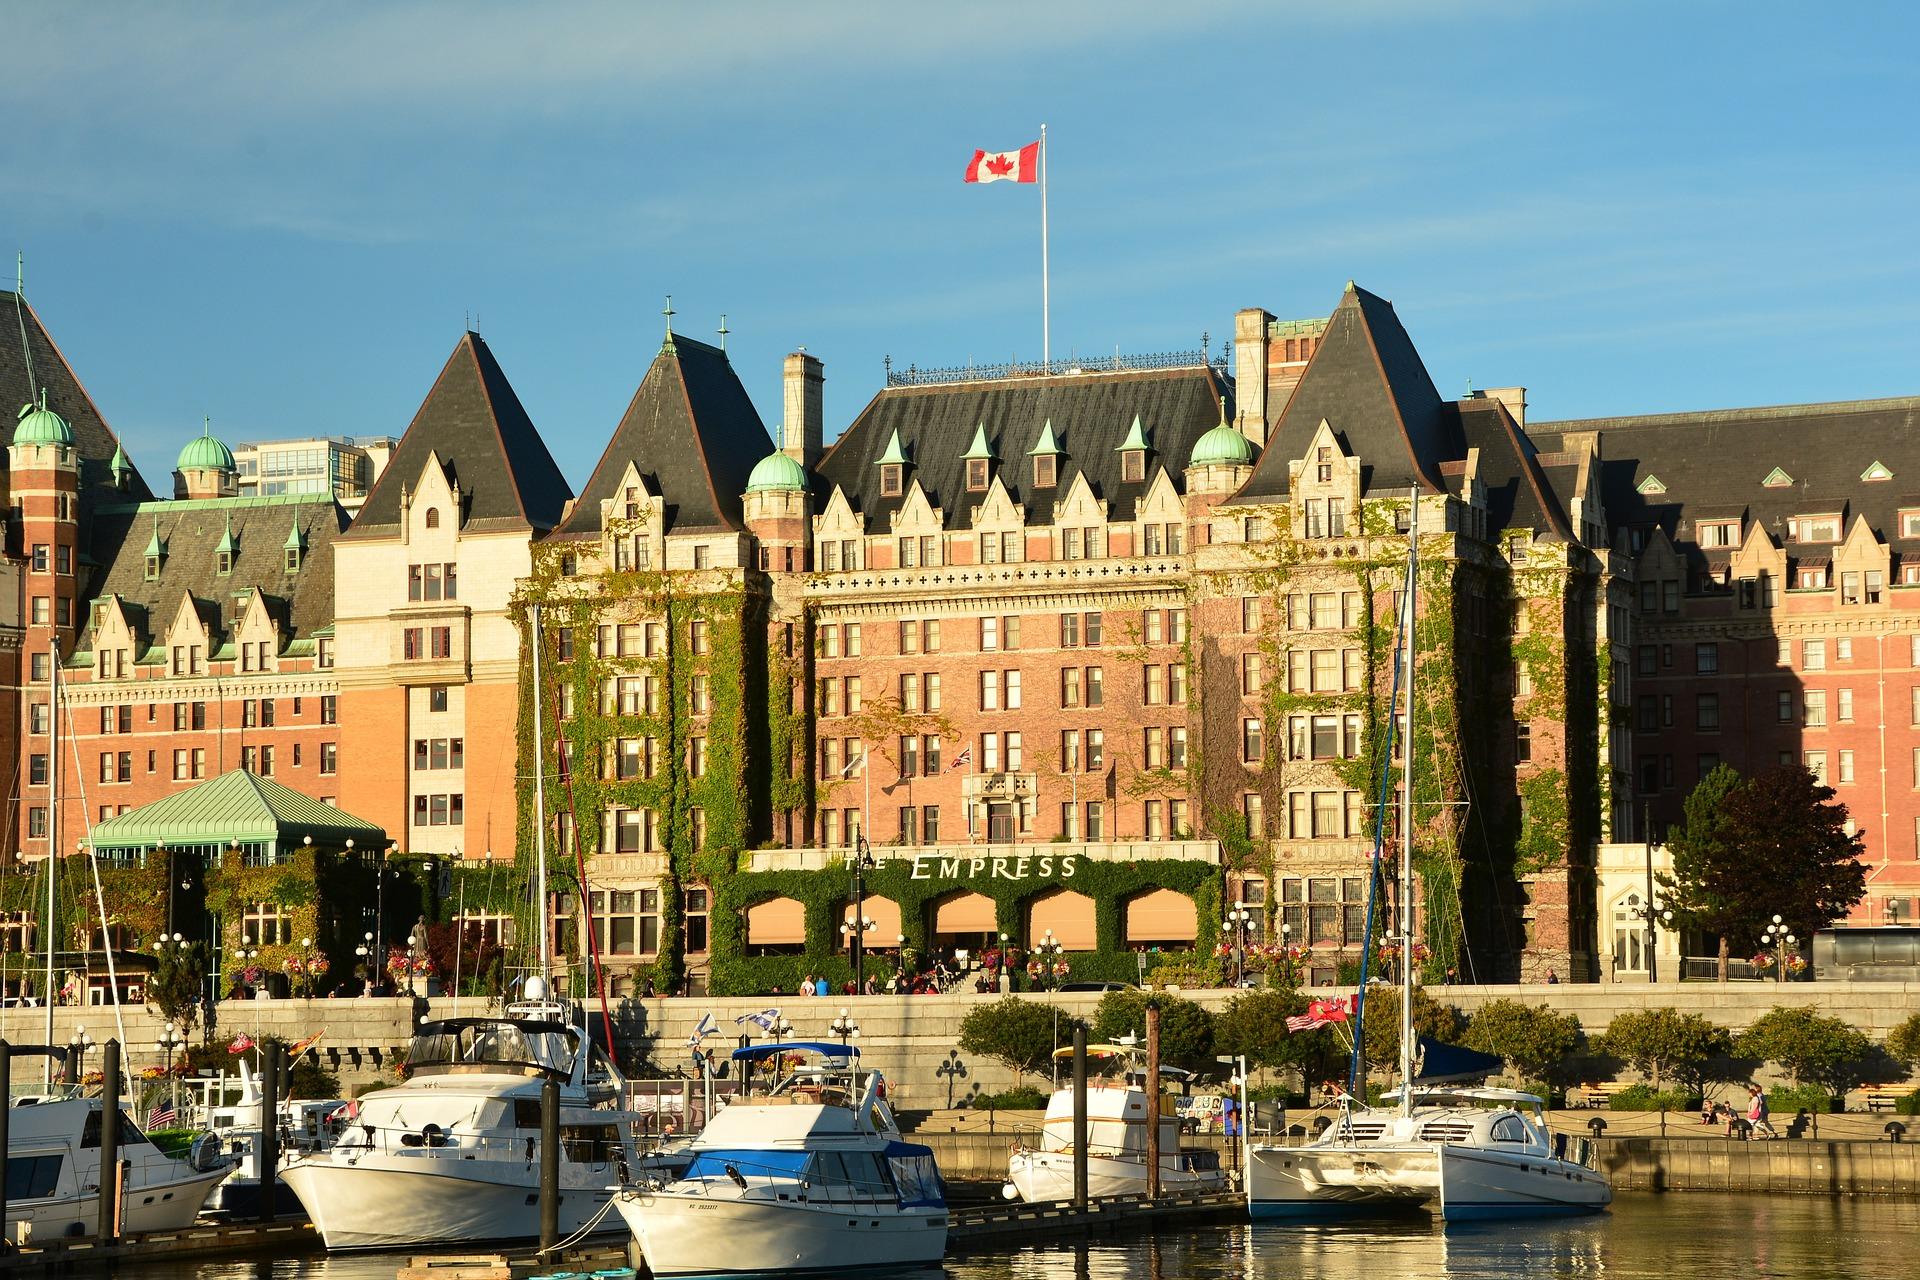 Vancouver Island High School Aufenthalt Kanada Victoria